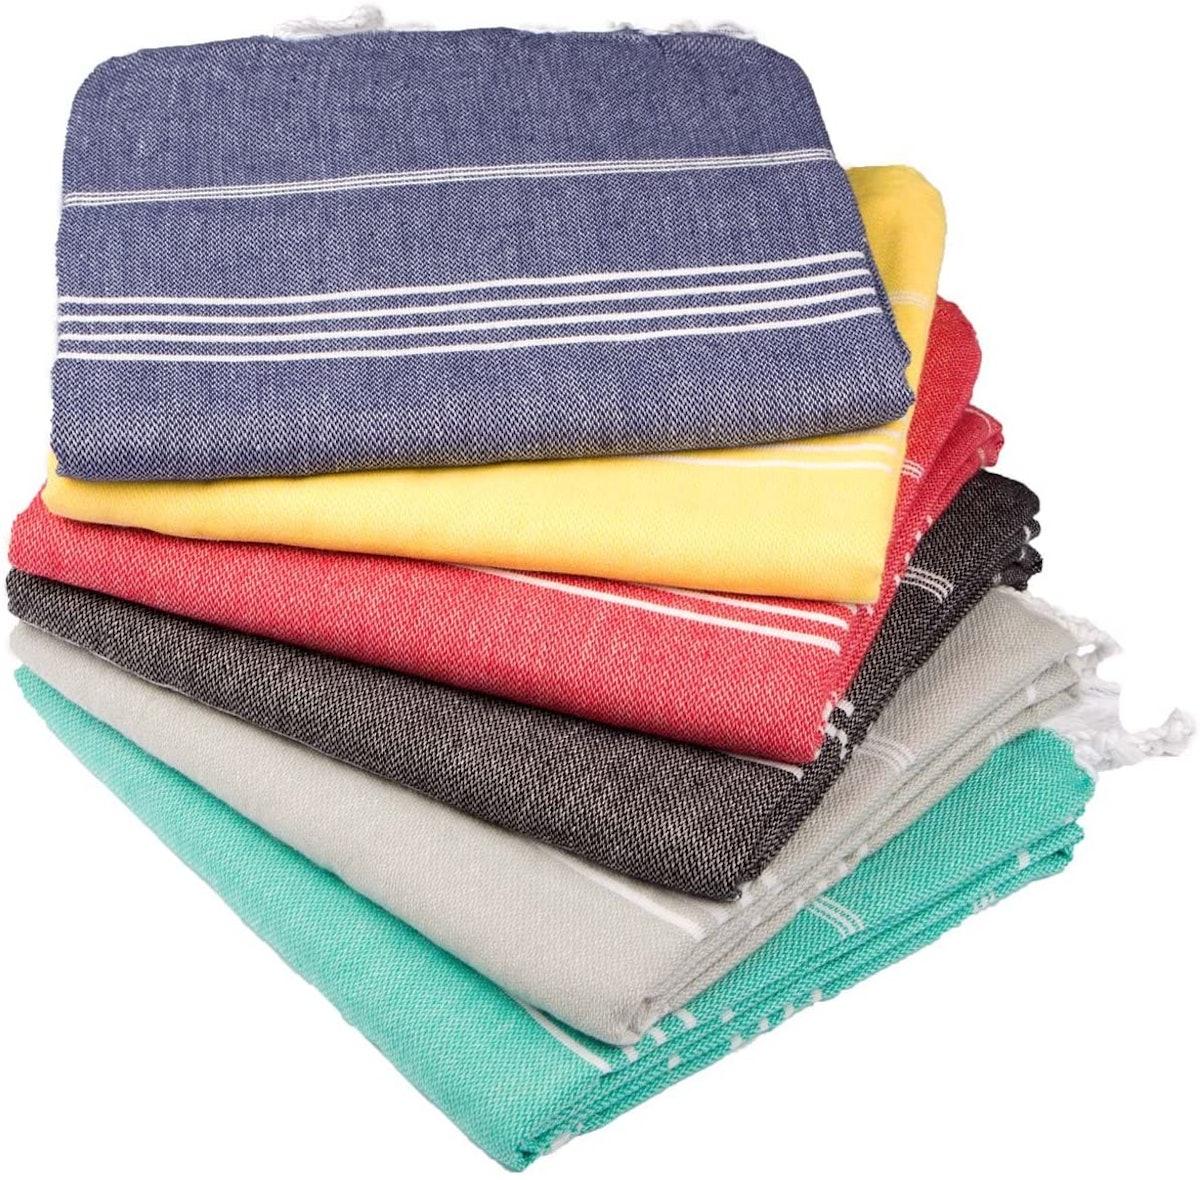 Clotho Turkish Towels, 6-Piece Set